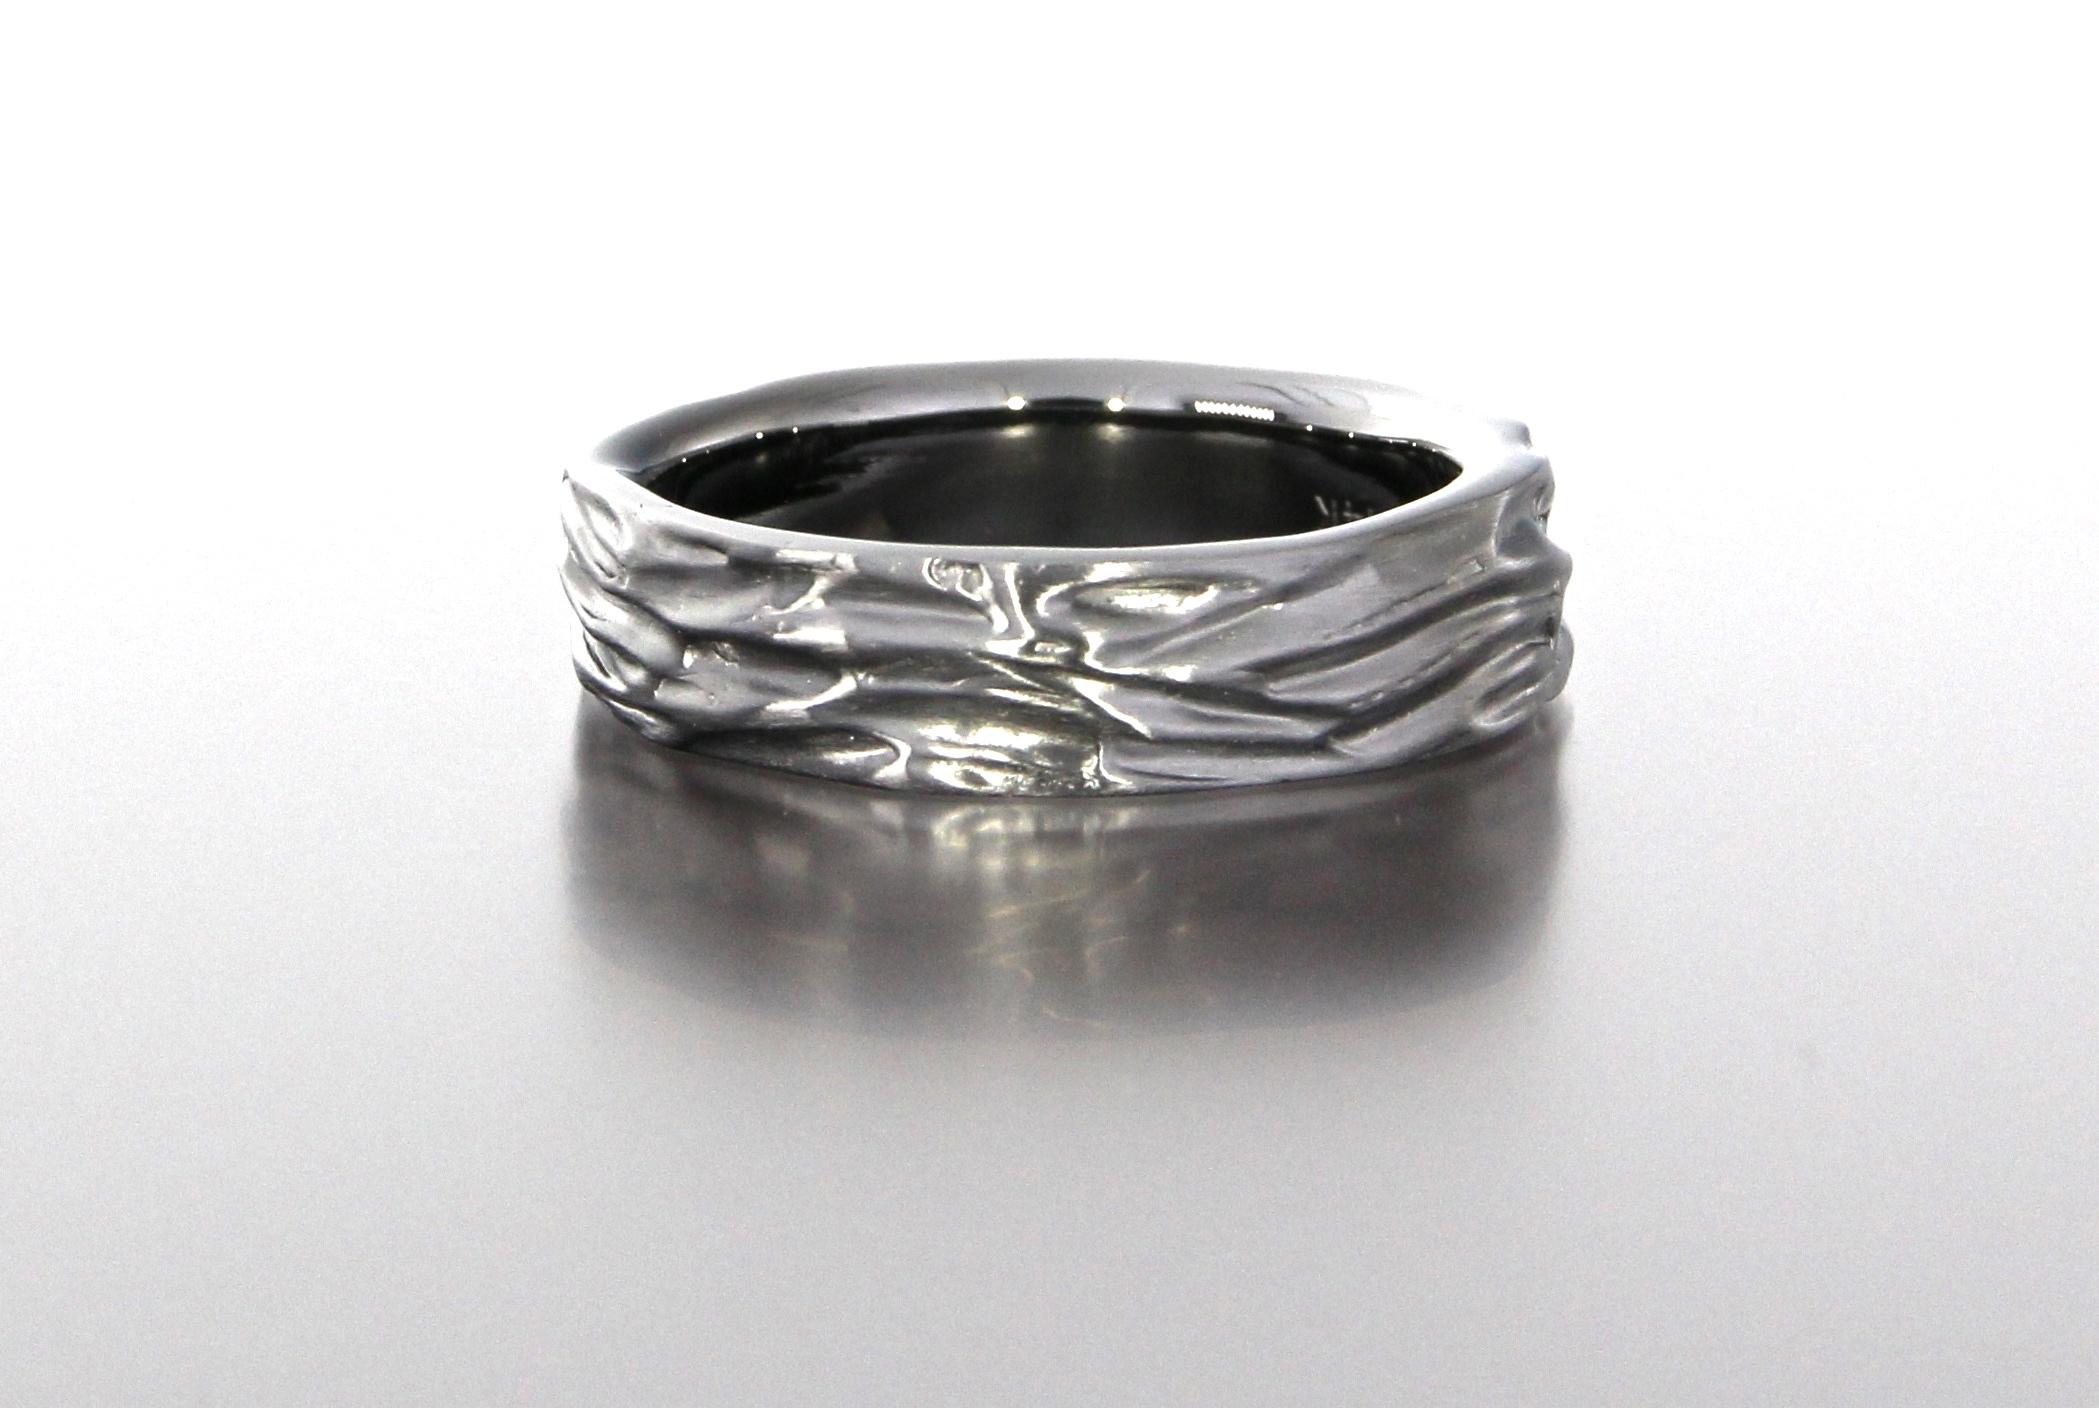 unique-mens-textured-wedding-band-black-band-gun-metal-gold-modern-design-craft-revival-jewelry-store-grand-rapids